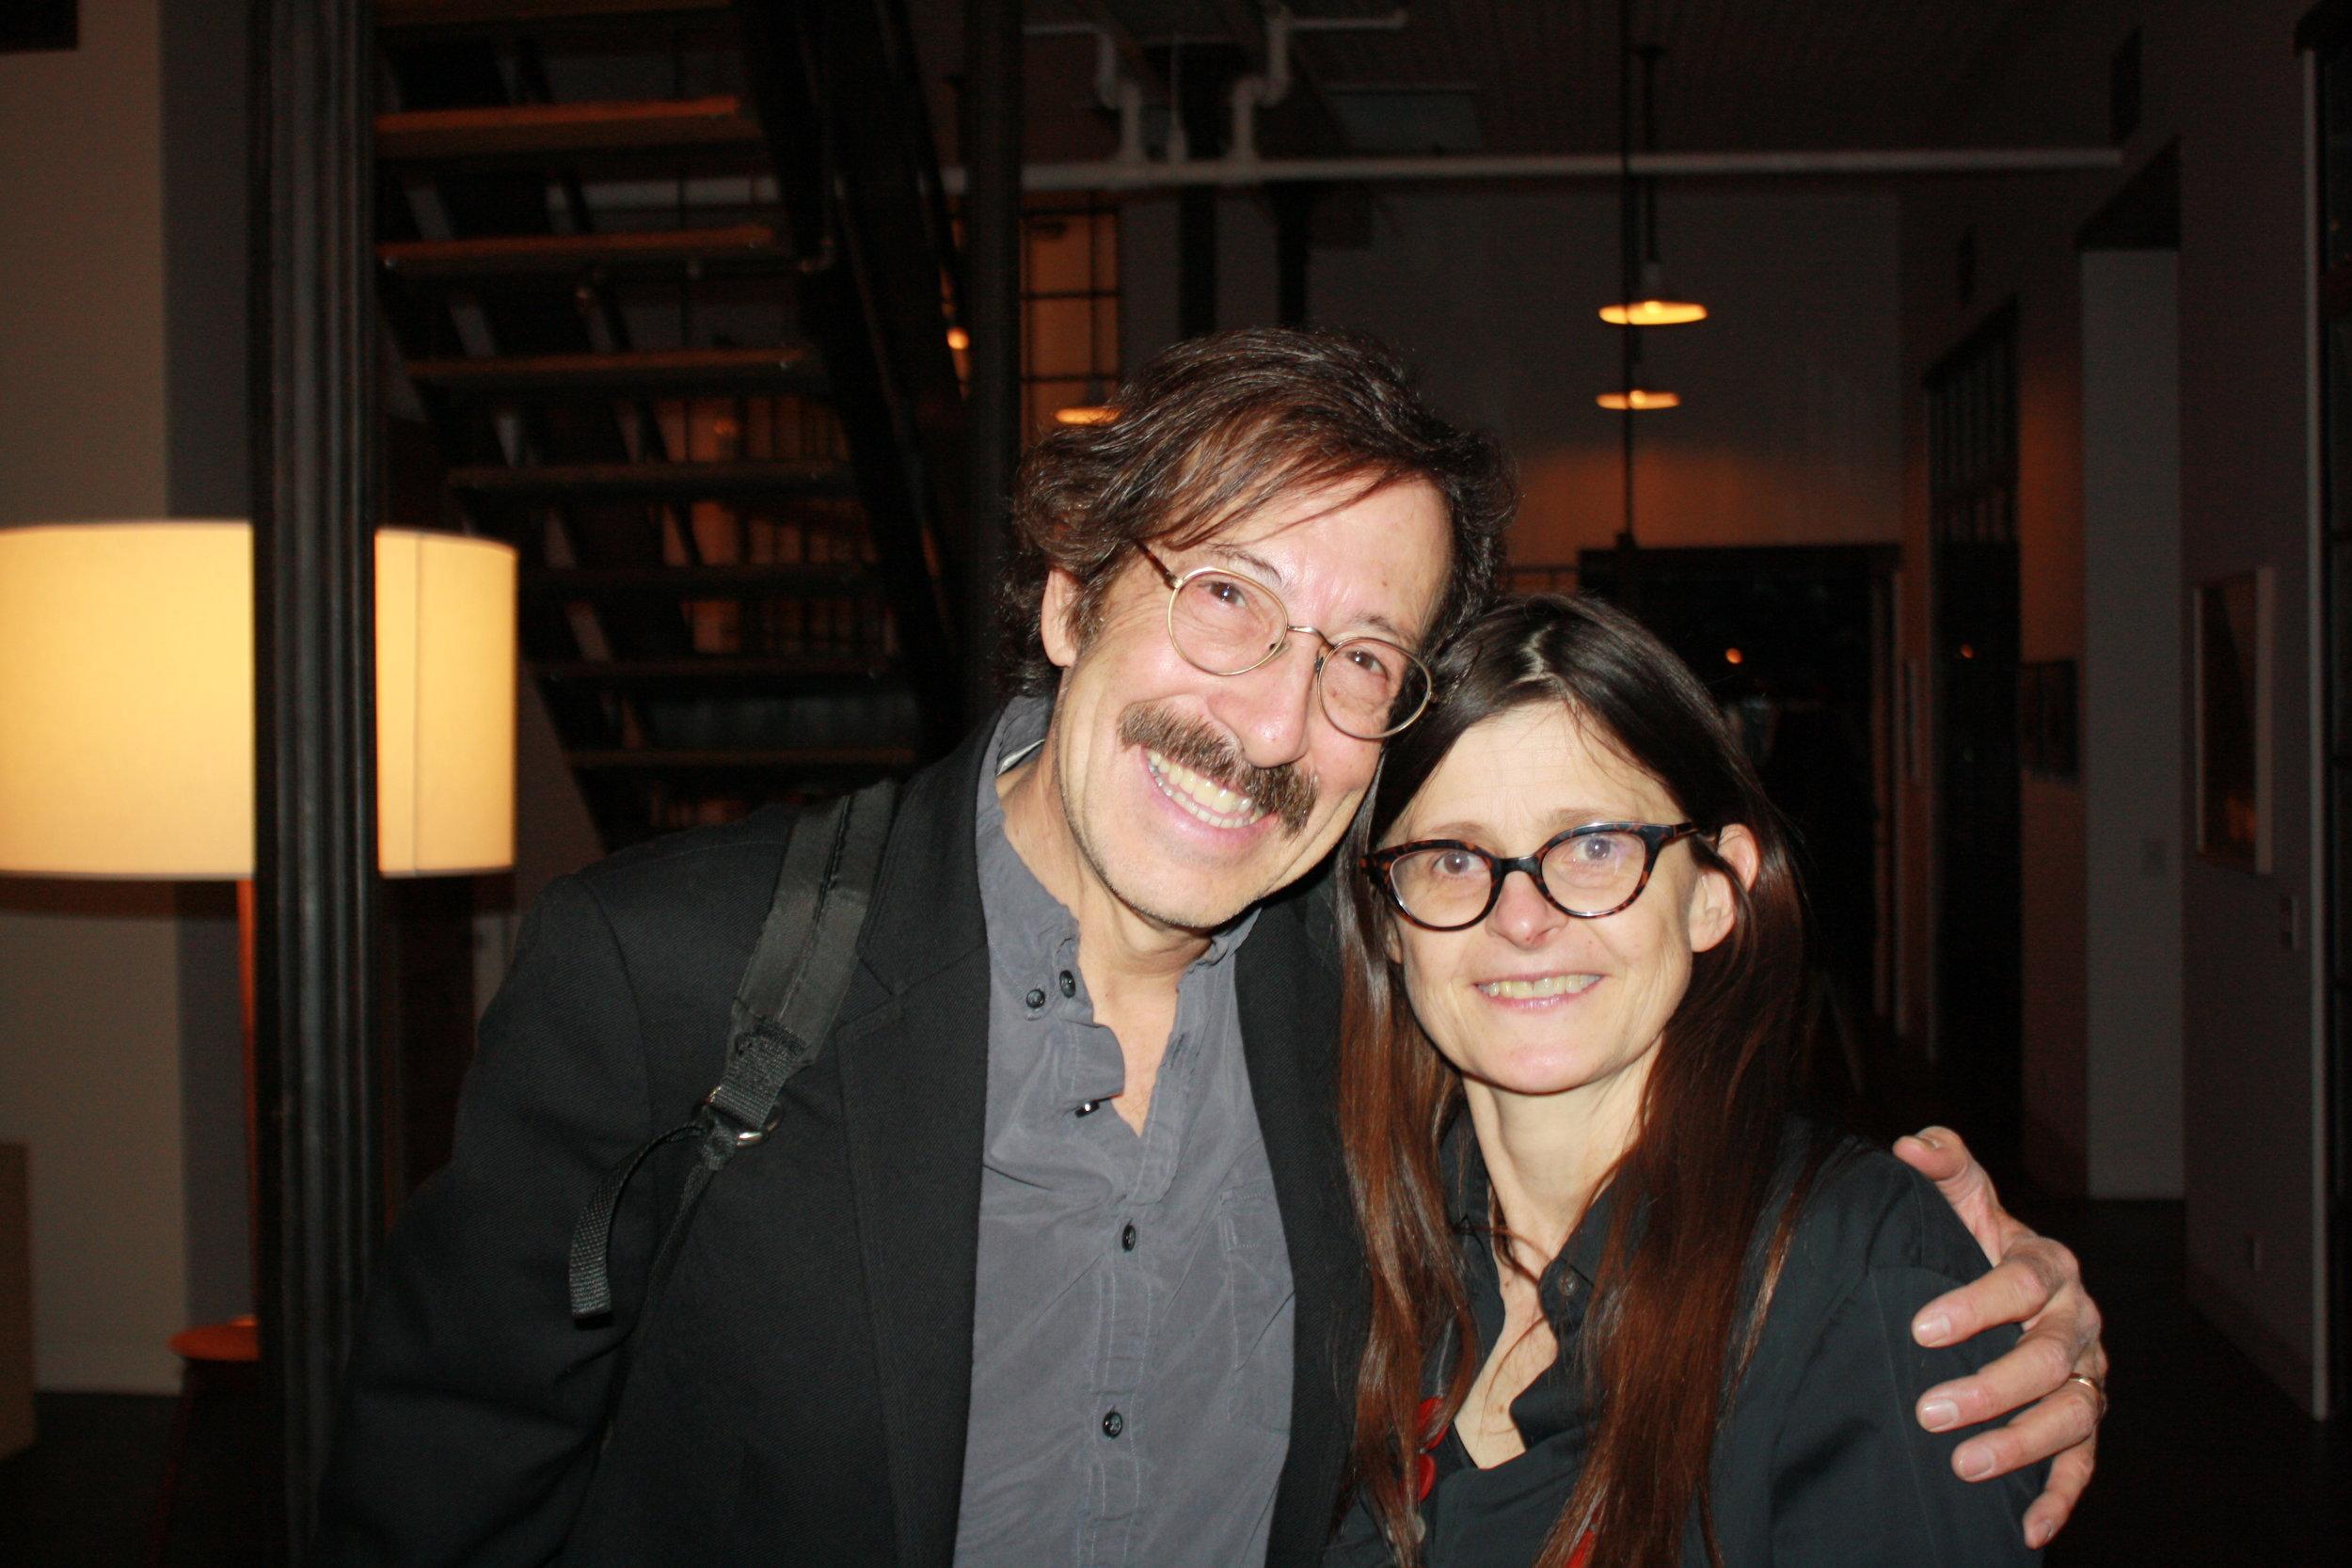 Rick Smolan and Belinda Luscombe